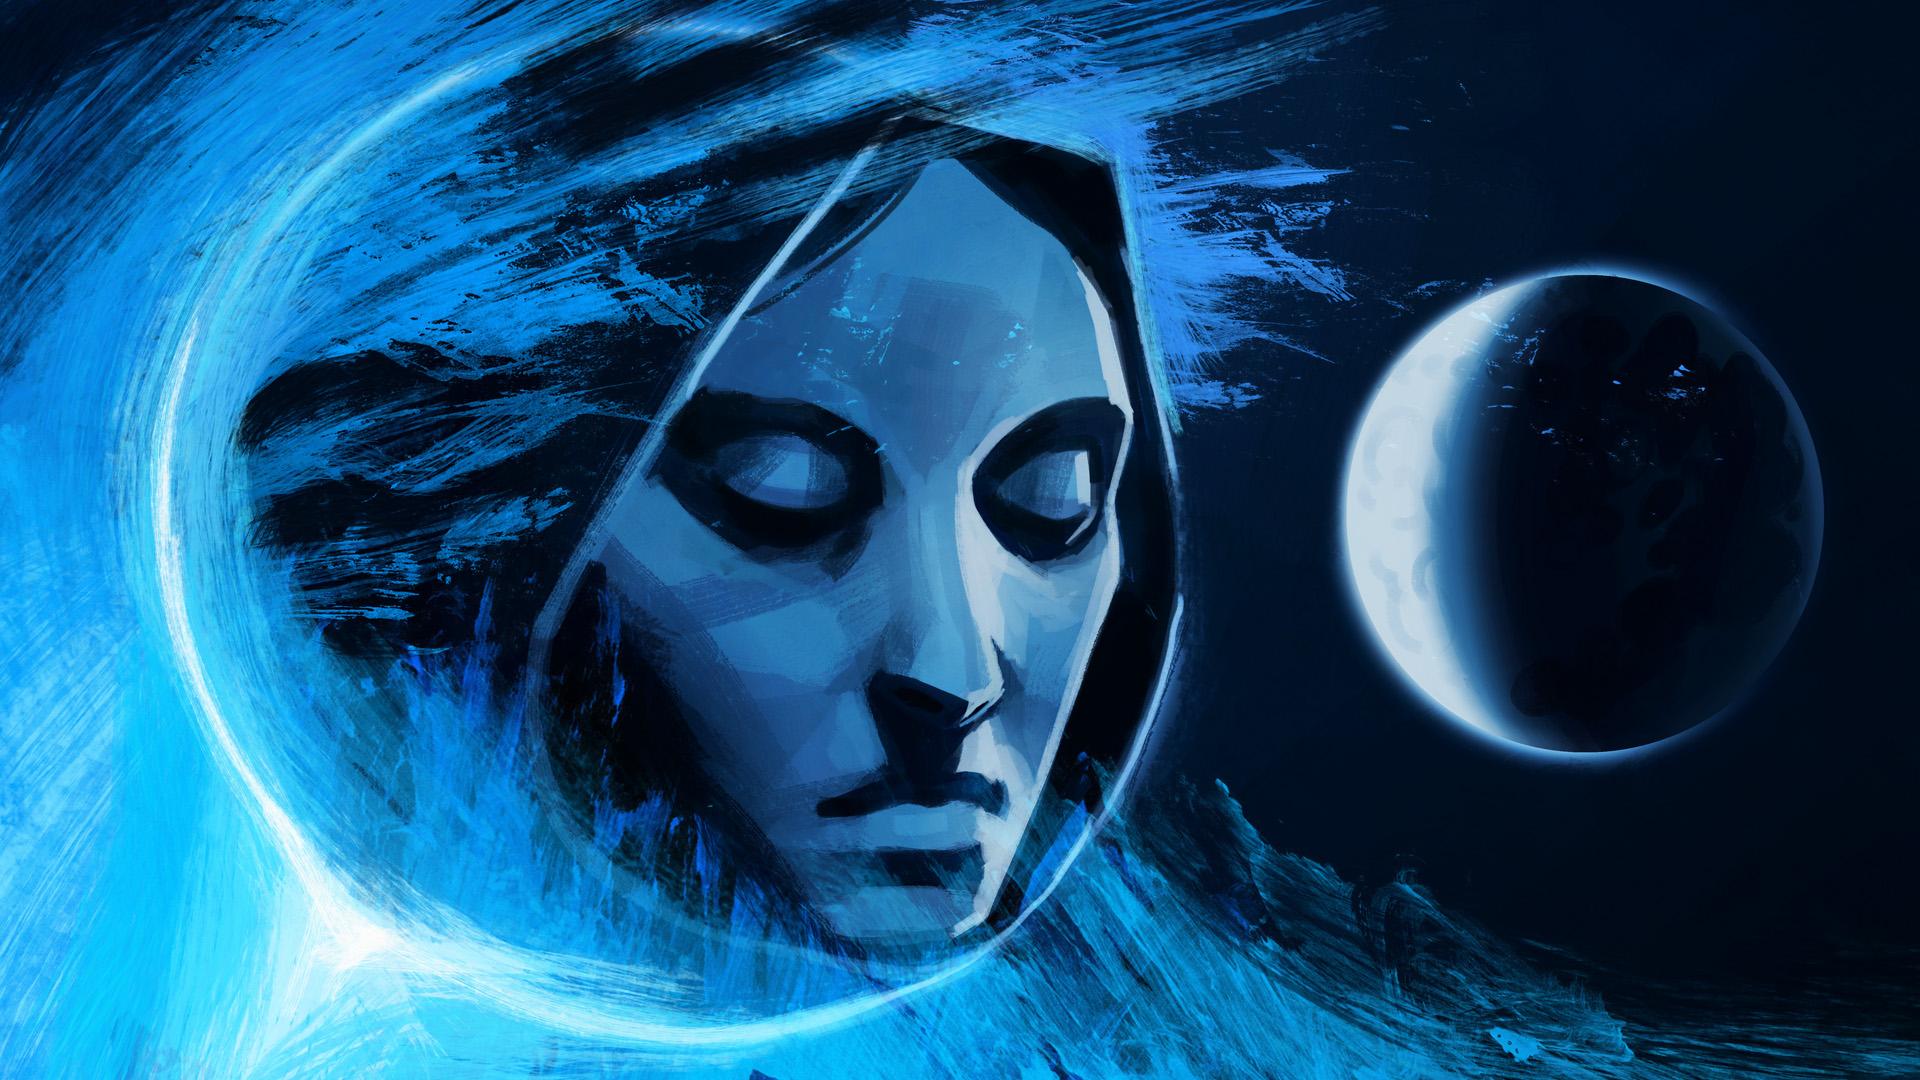 goddess_of_the_moon_2_by_makkon-d4l94gu.jpg